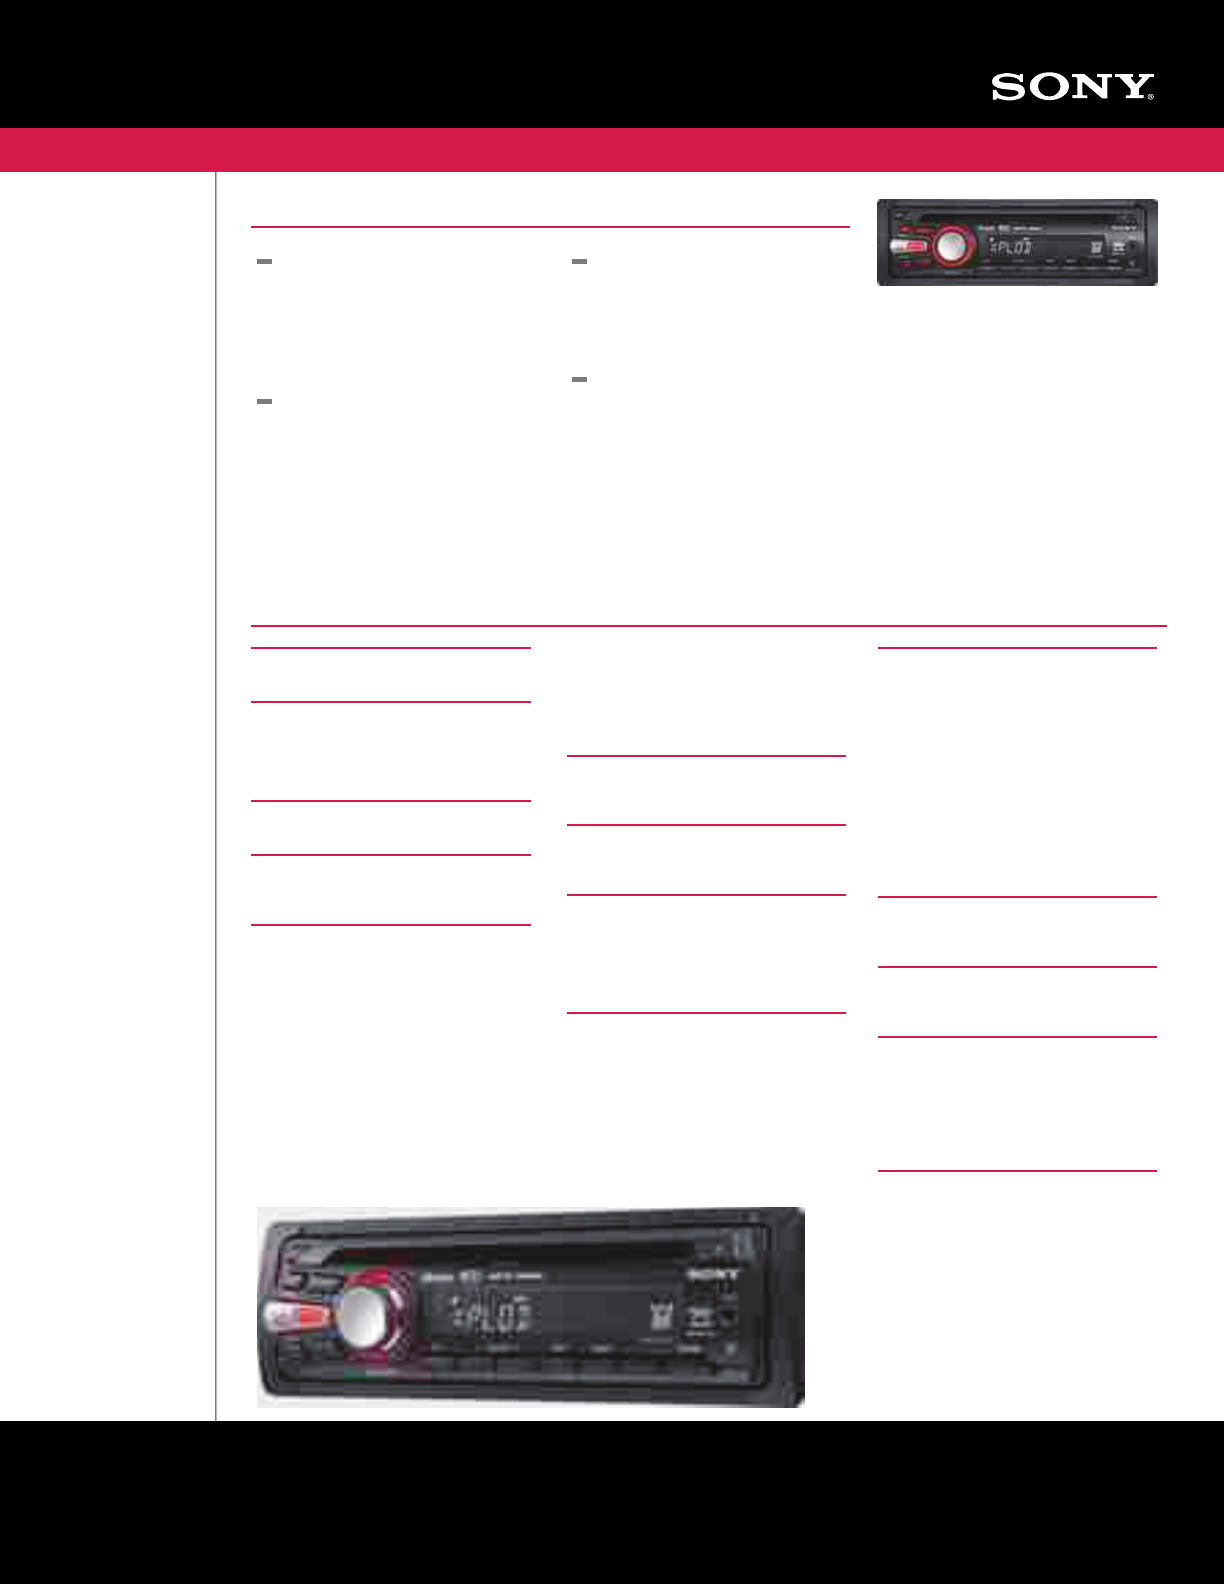 Sony Xplod Cdx Gt330 Wiring Diagram